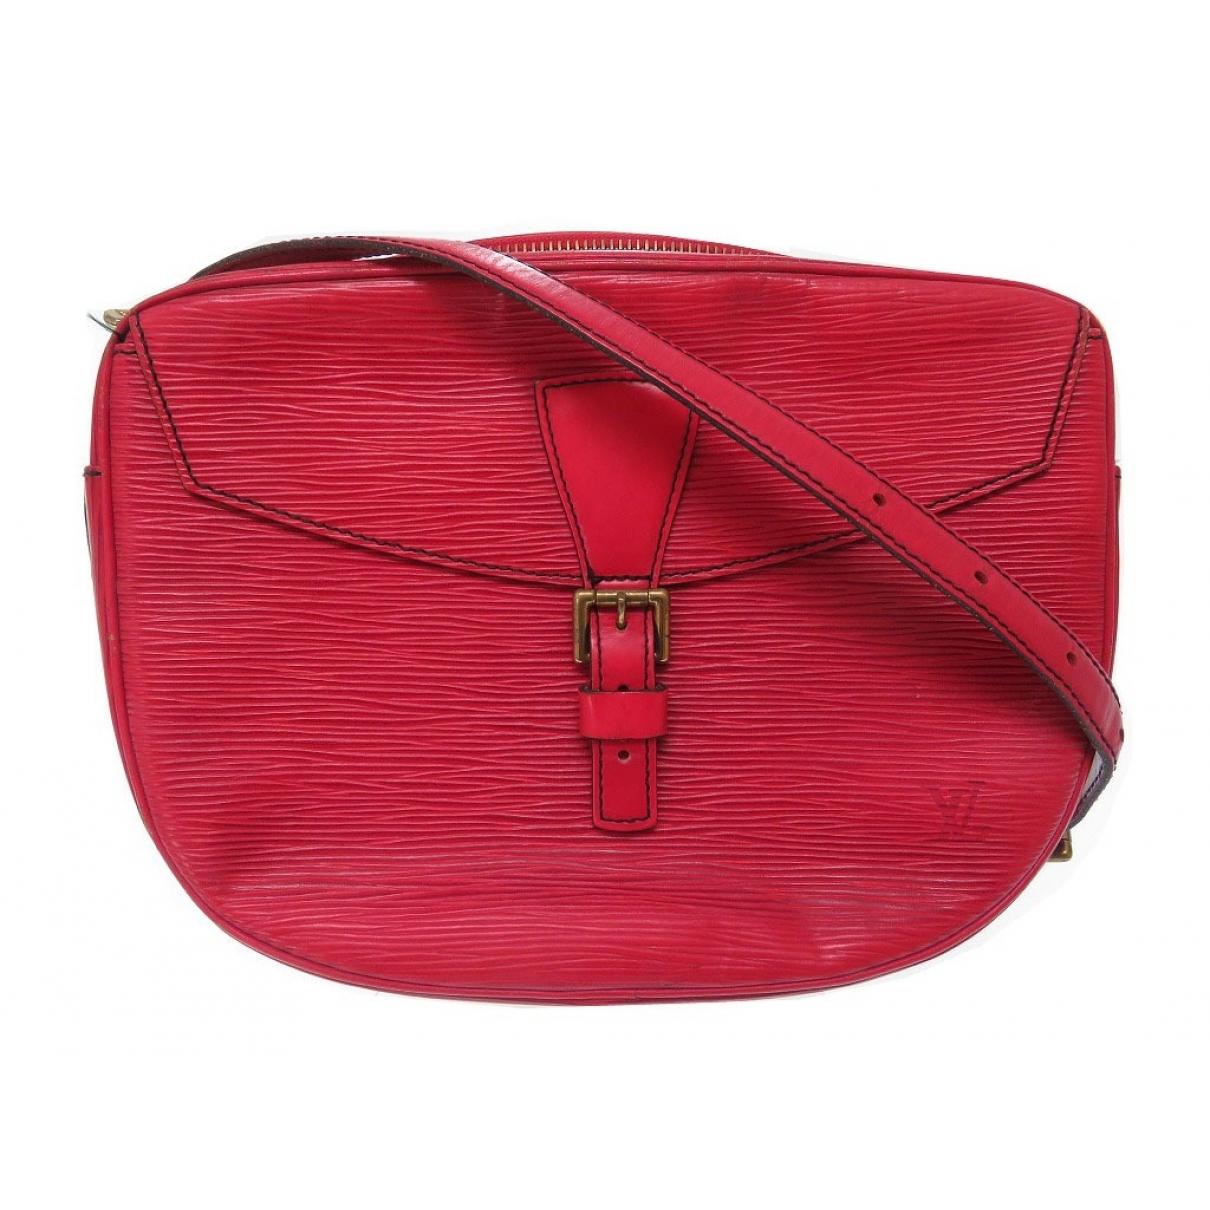 Louis Vuitton Jeune fille  Handtasche in  Rot Leder